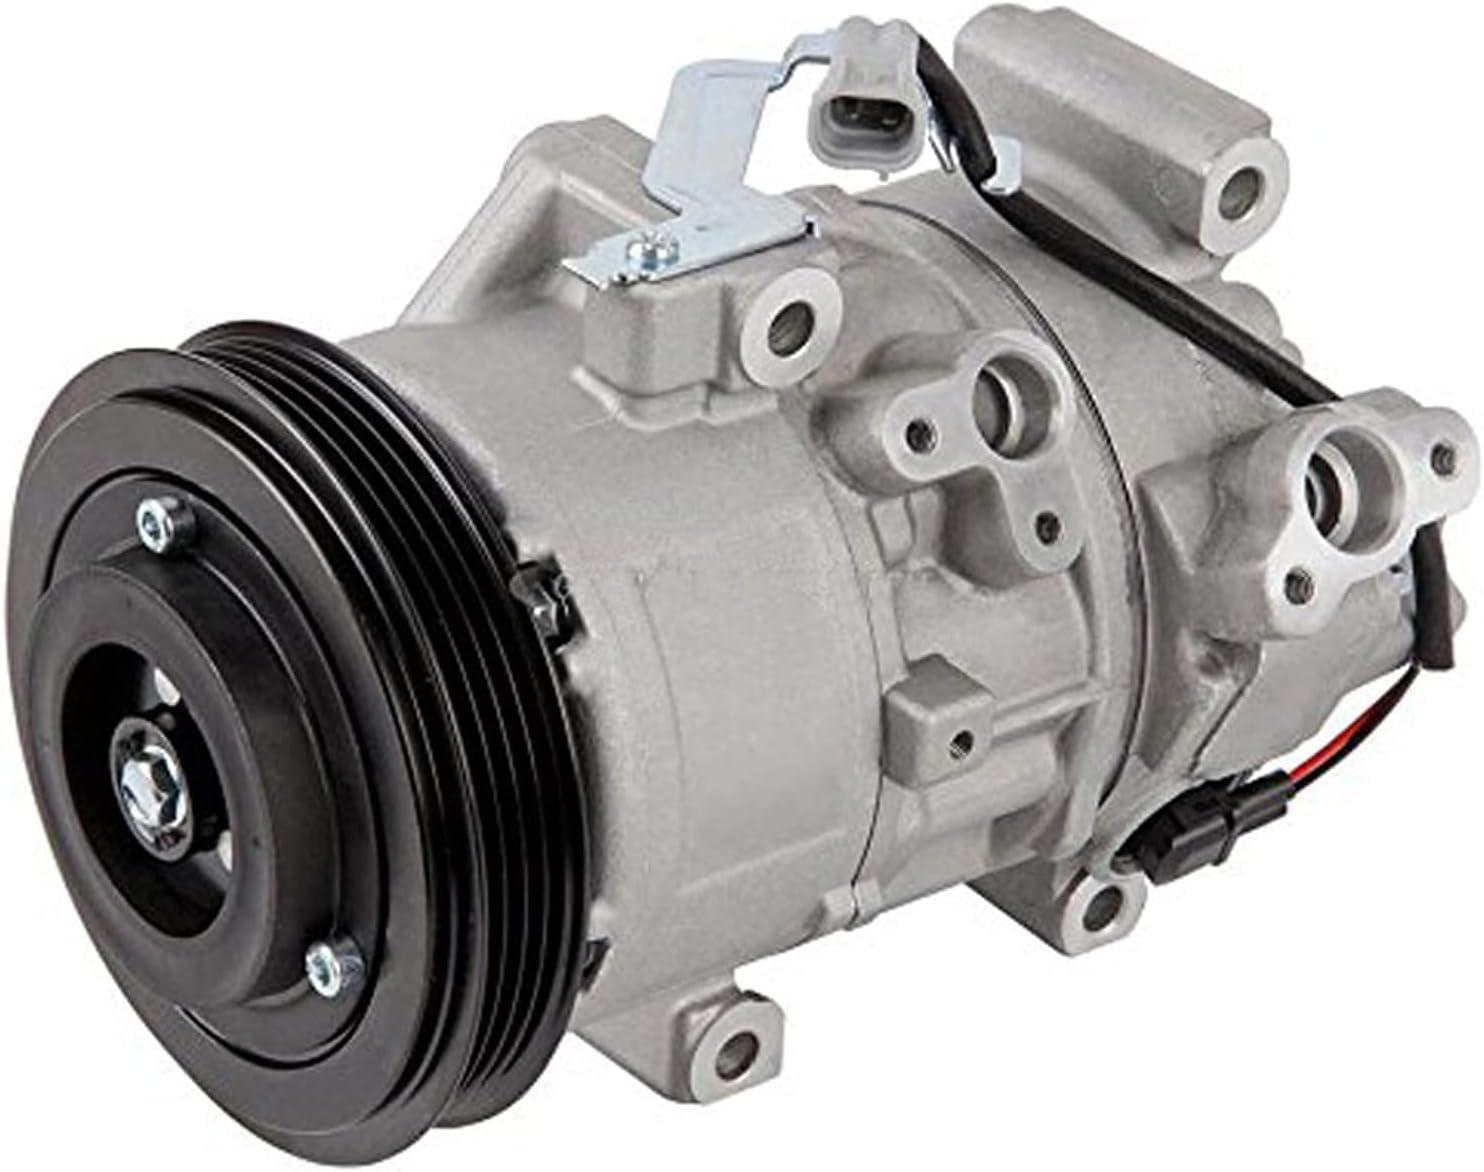 COPACHI 447260-1172 Max 41% OFF 5SE11C 4PK Ranking TOP5 AC 2007-2013 Yaris Compressor for